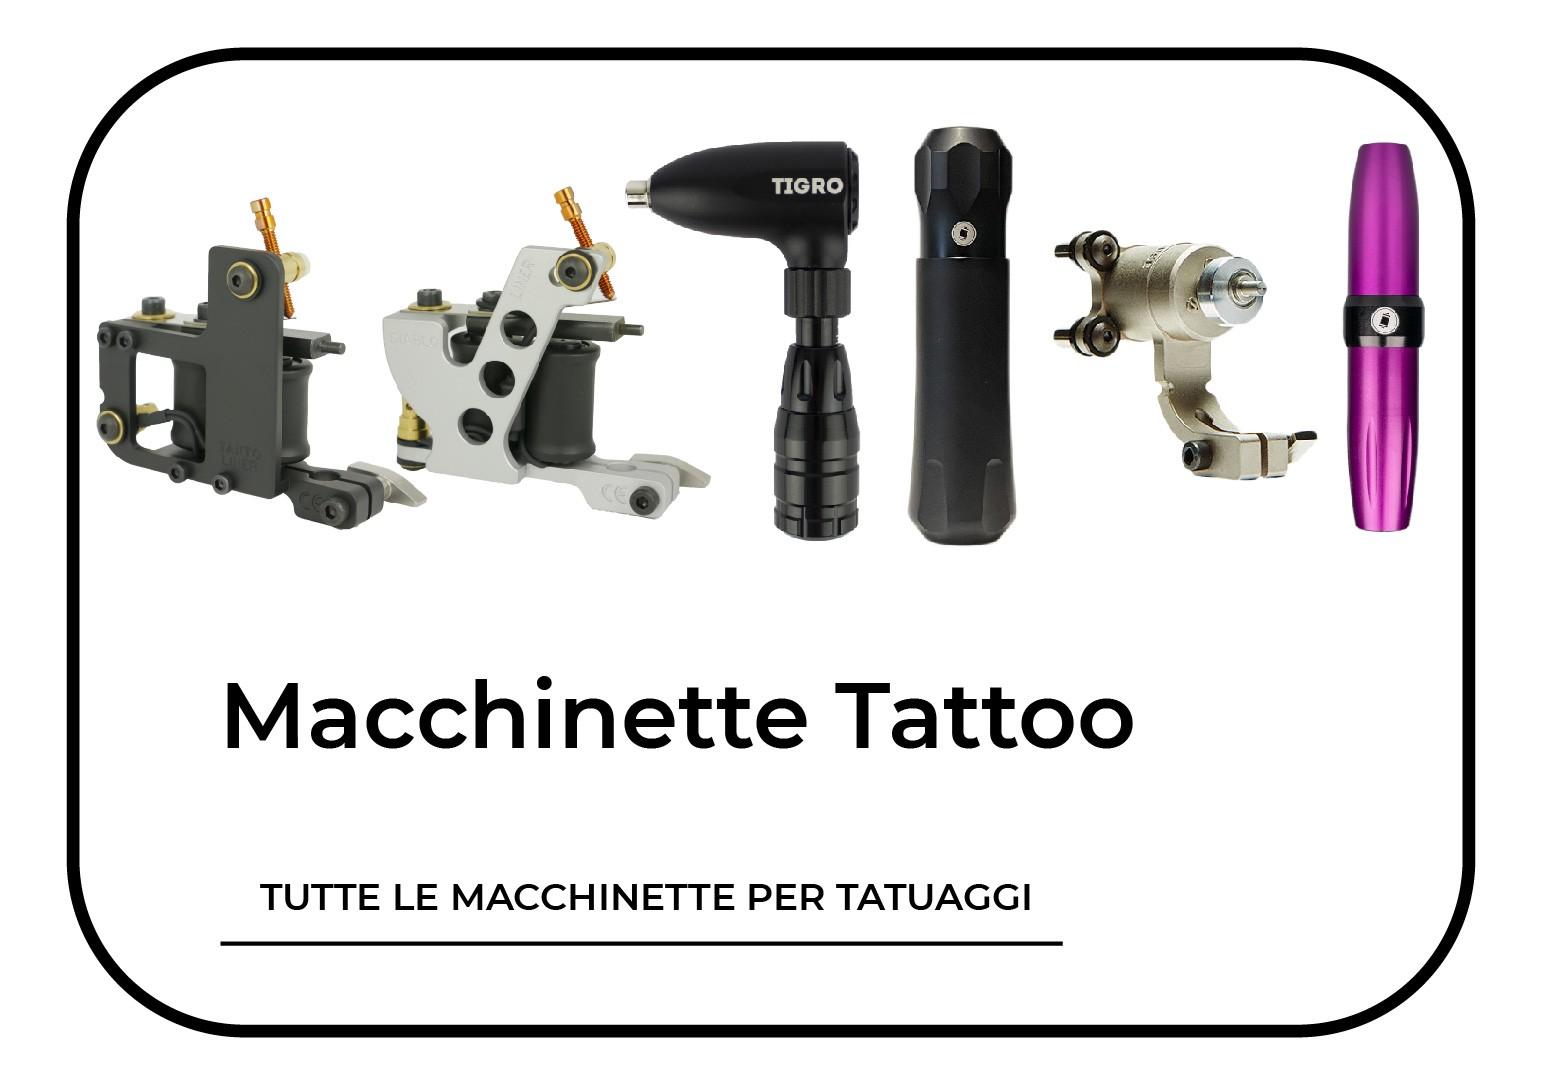 Macchinette Tattoo